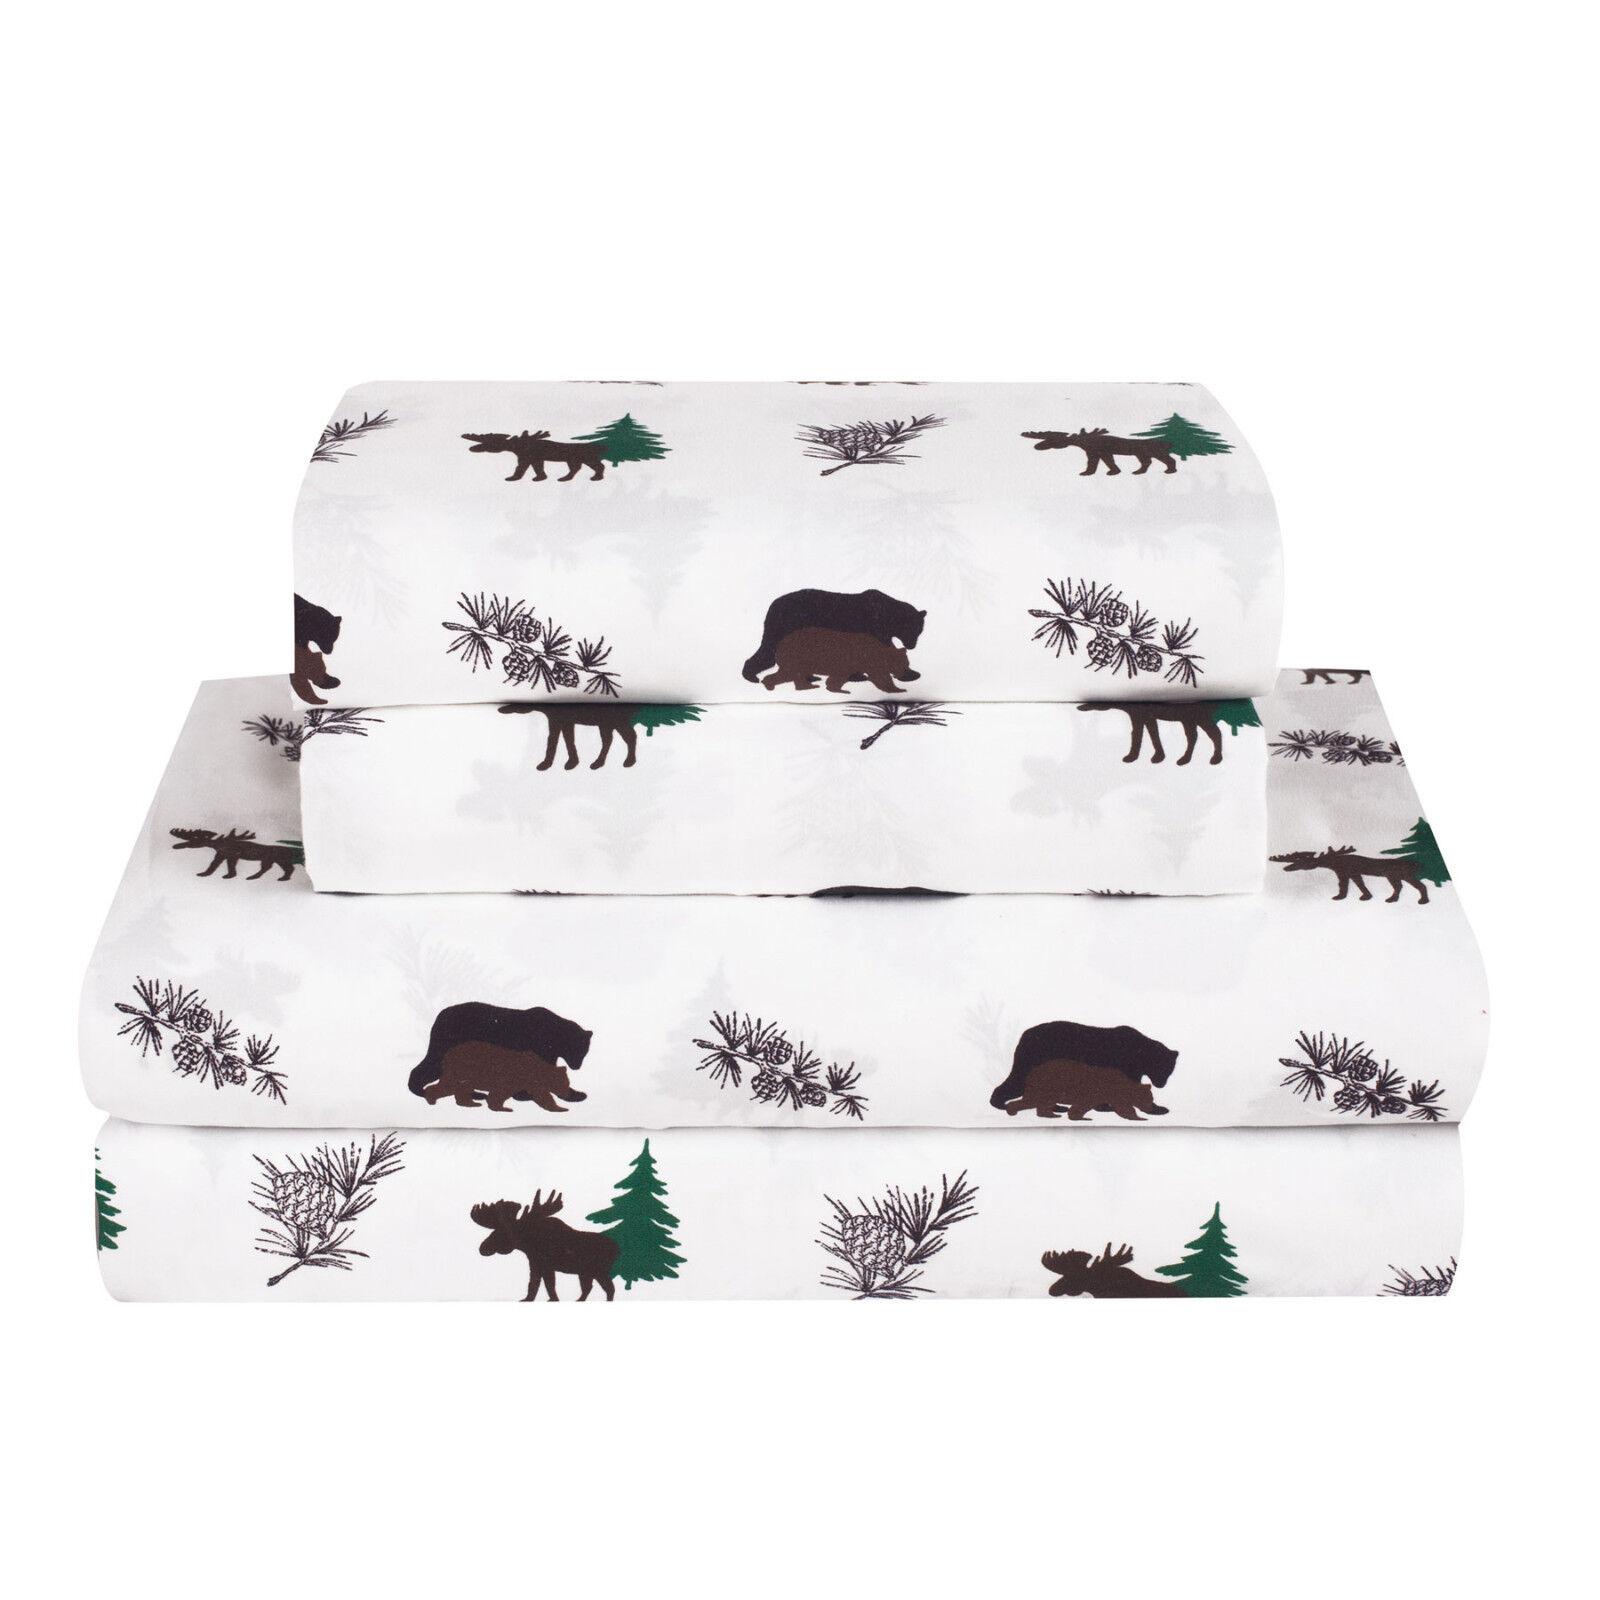 Twin, Full, Queen, King Rustic Bear Moose Bed Sheet Set Microfiber Cabin Hunting Bedding